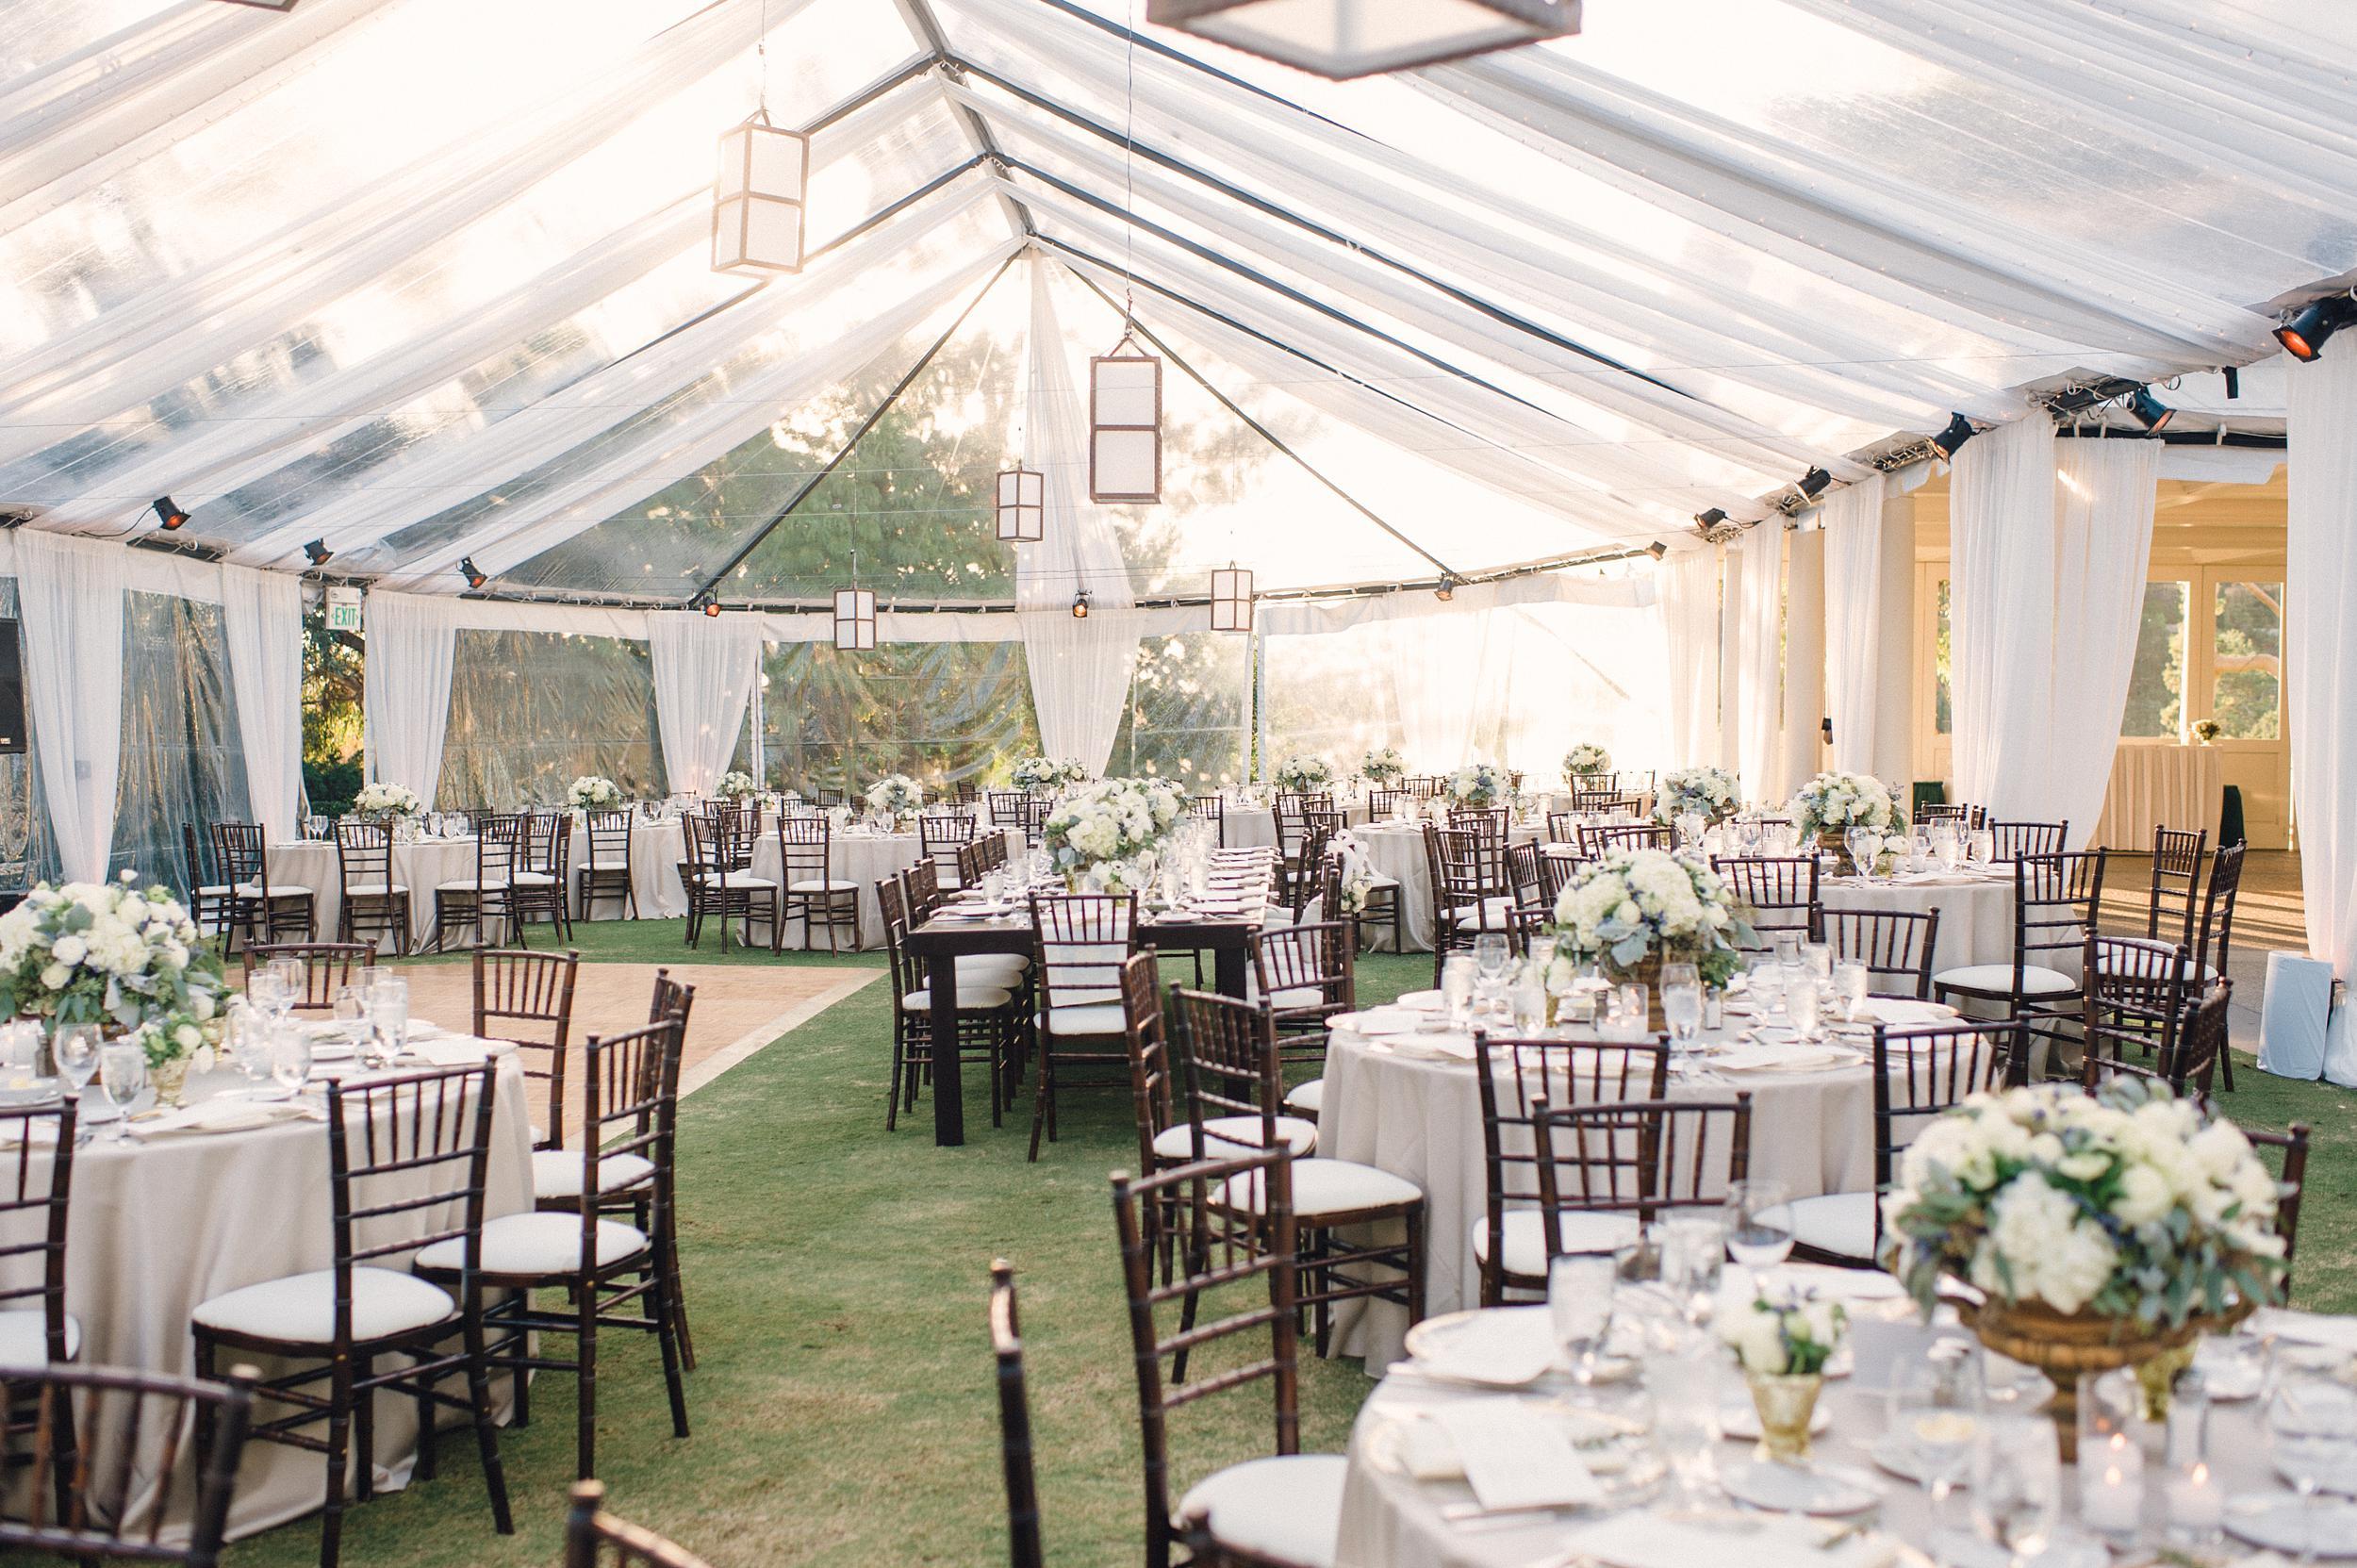 annandale-golf-club-pasadena-wedding-JM-04.jpg